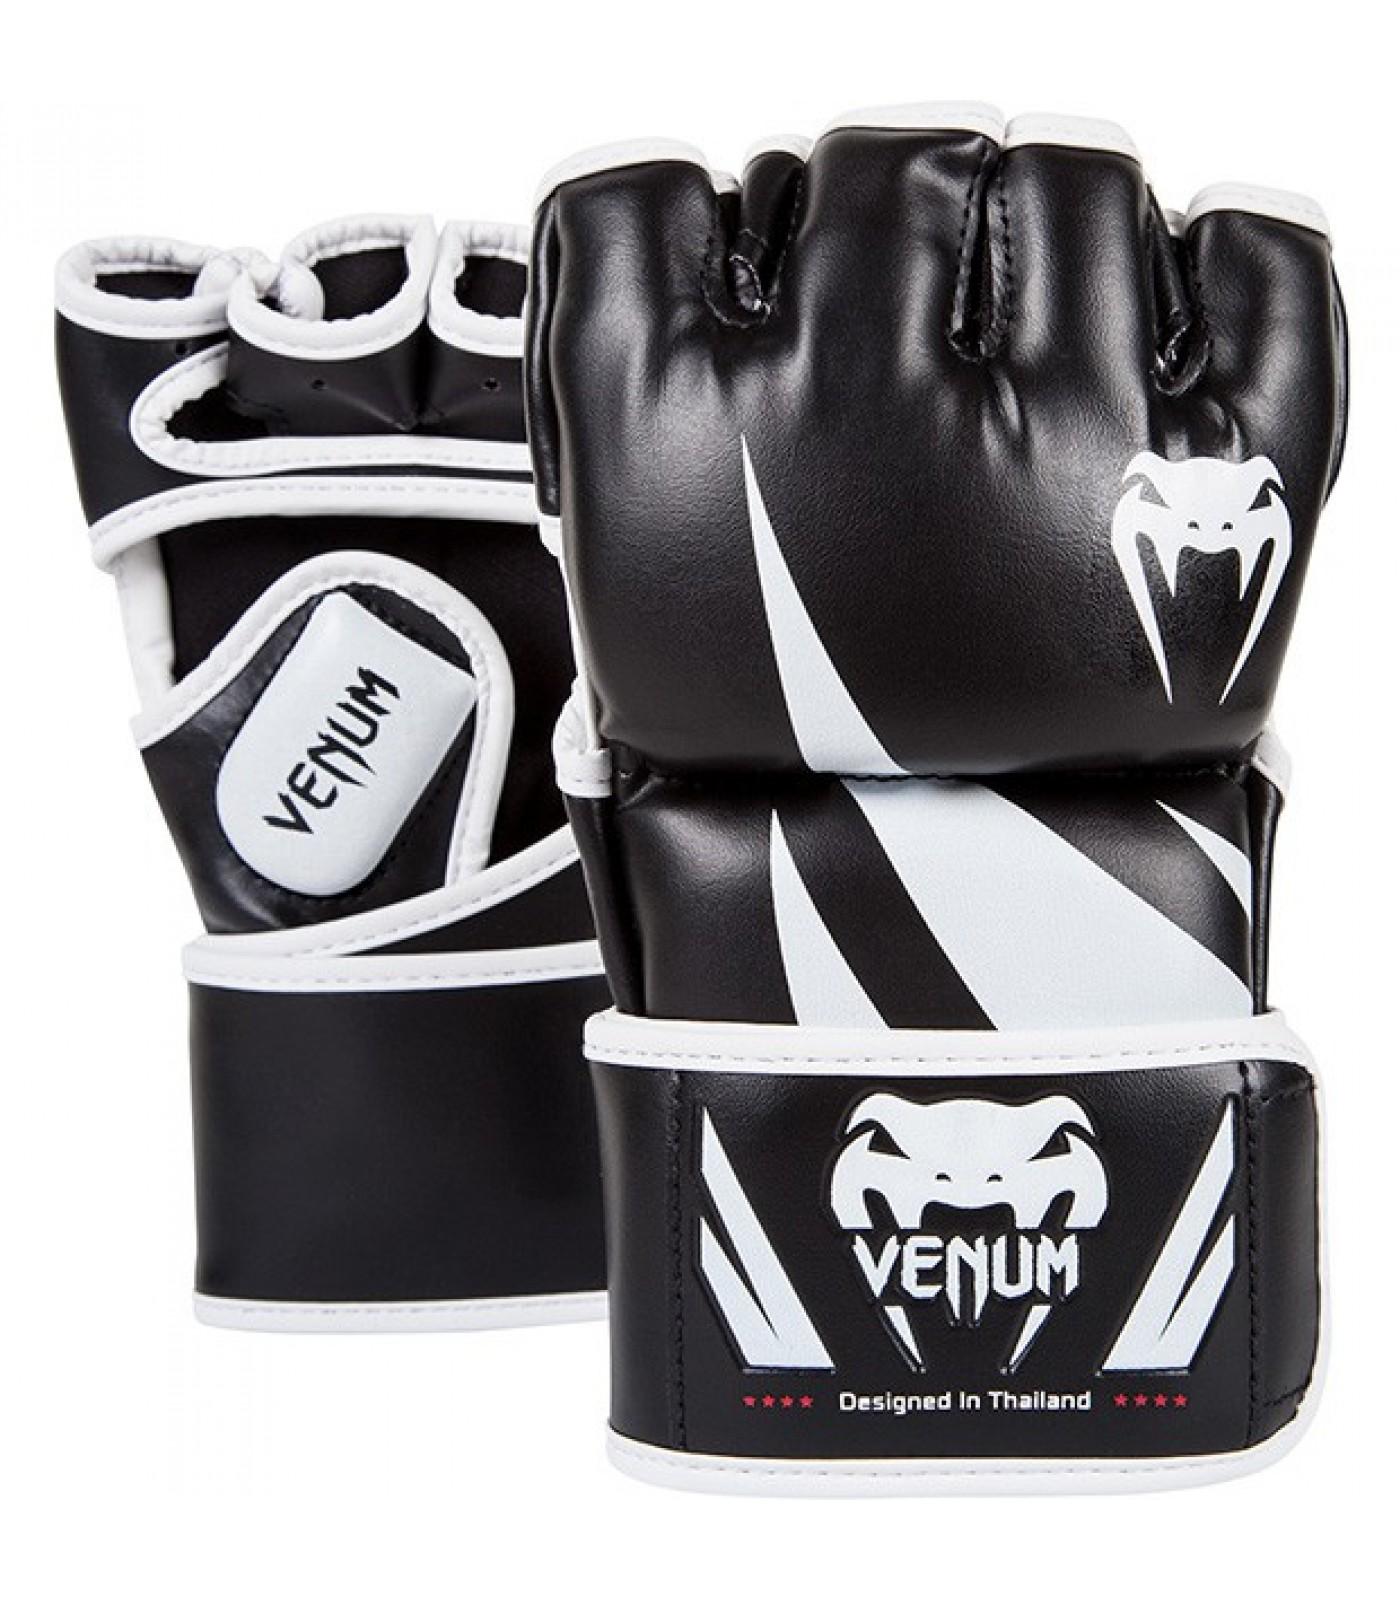 ММА ръкавици - Venum Challenger MMA Gloves - Black